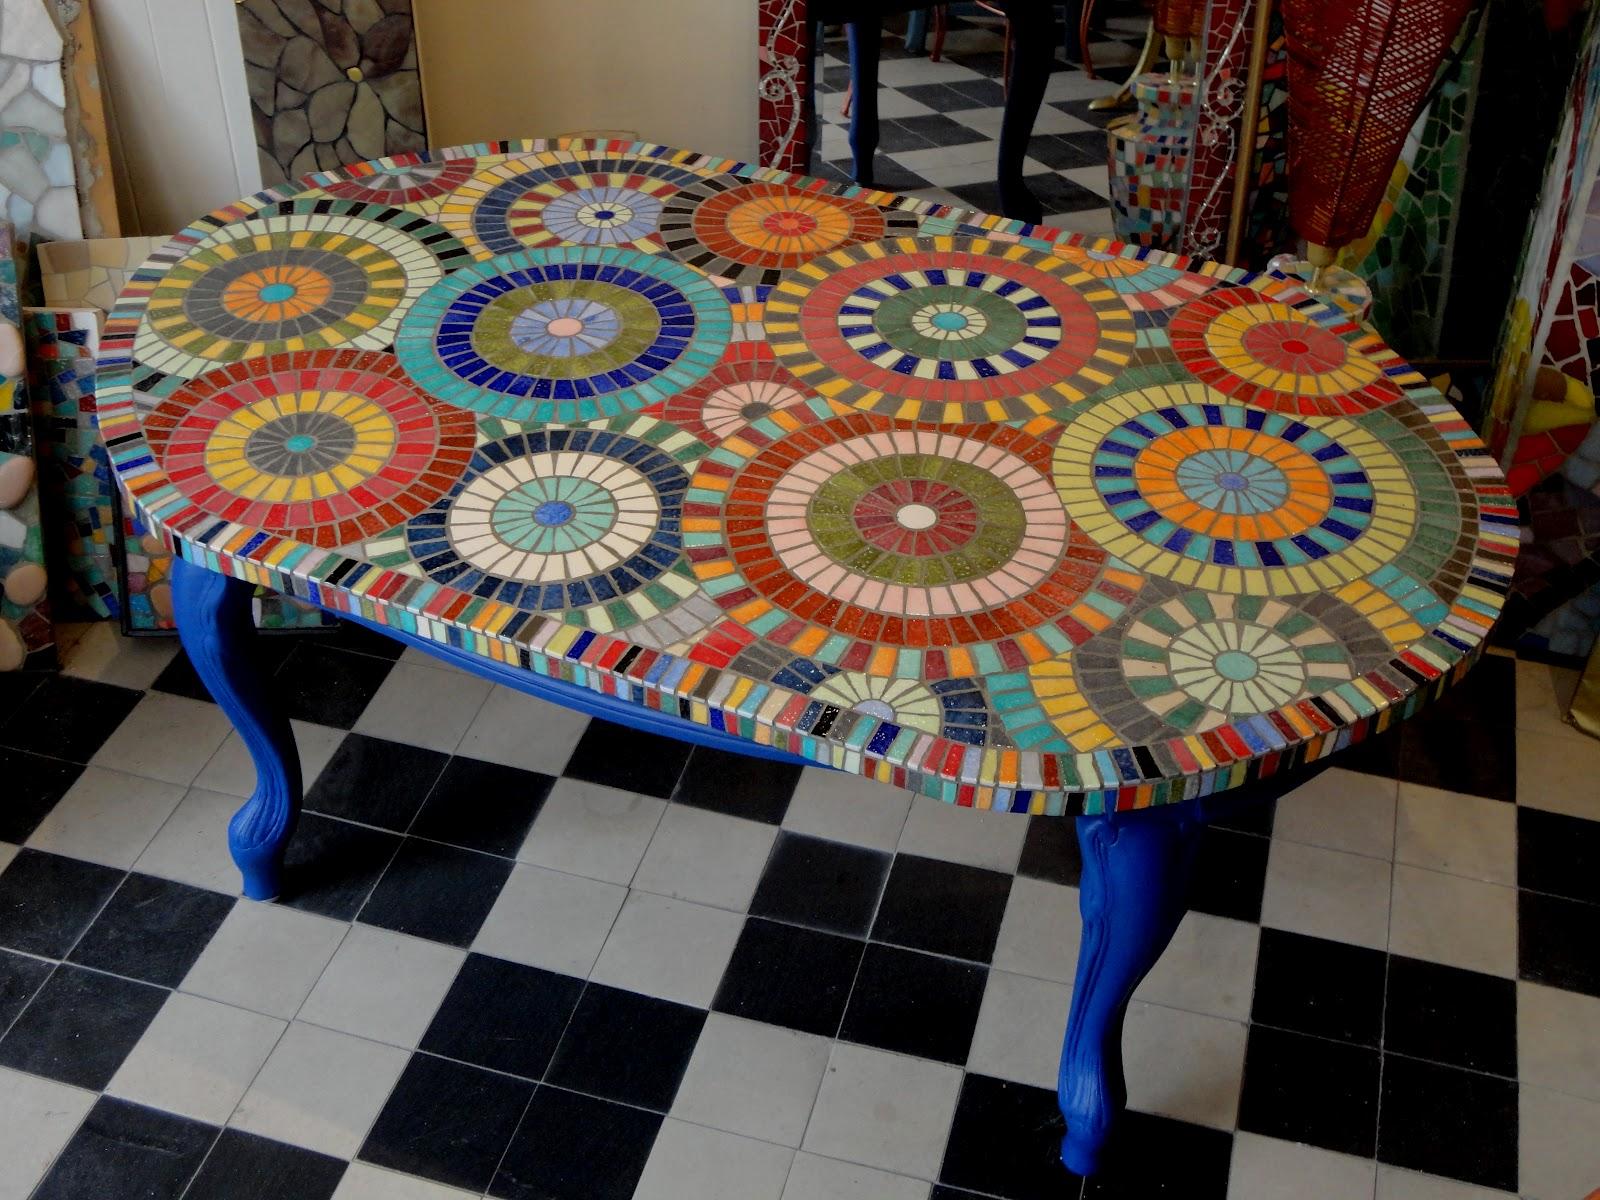 mosa ques les flocats plateaux de tables. Black Bedroom Furniture Sets. Home Design Ideas